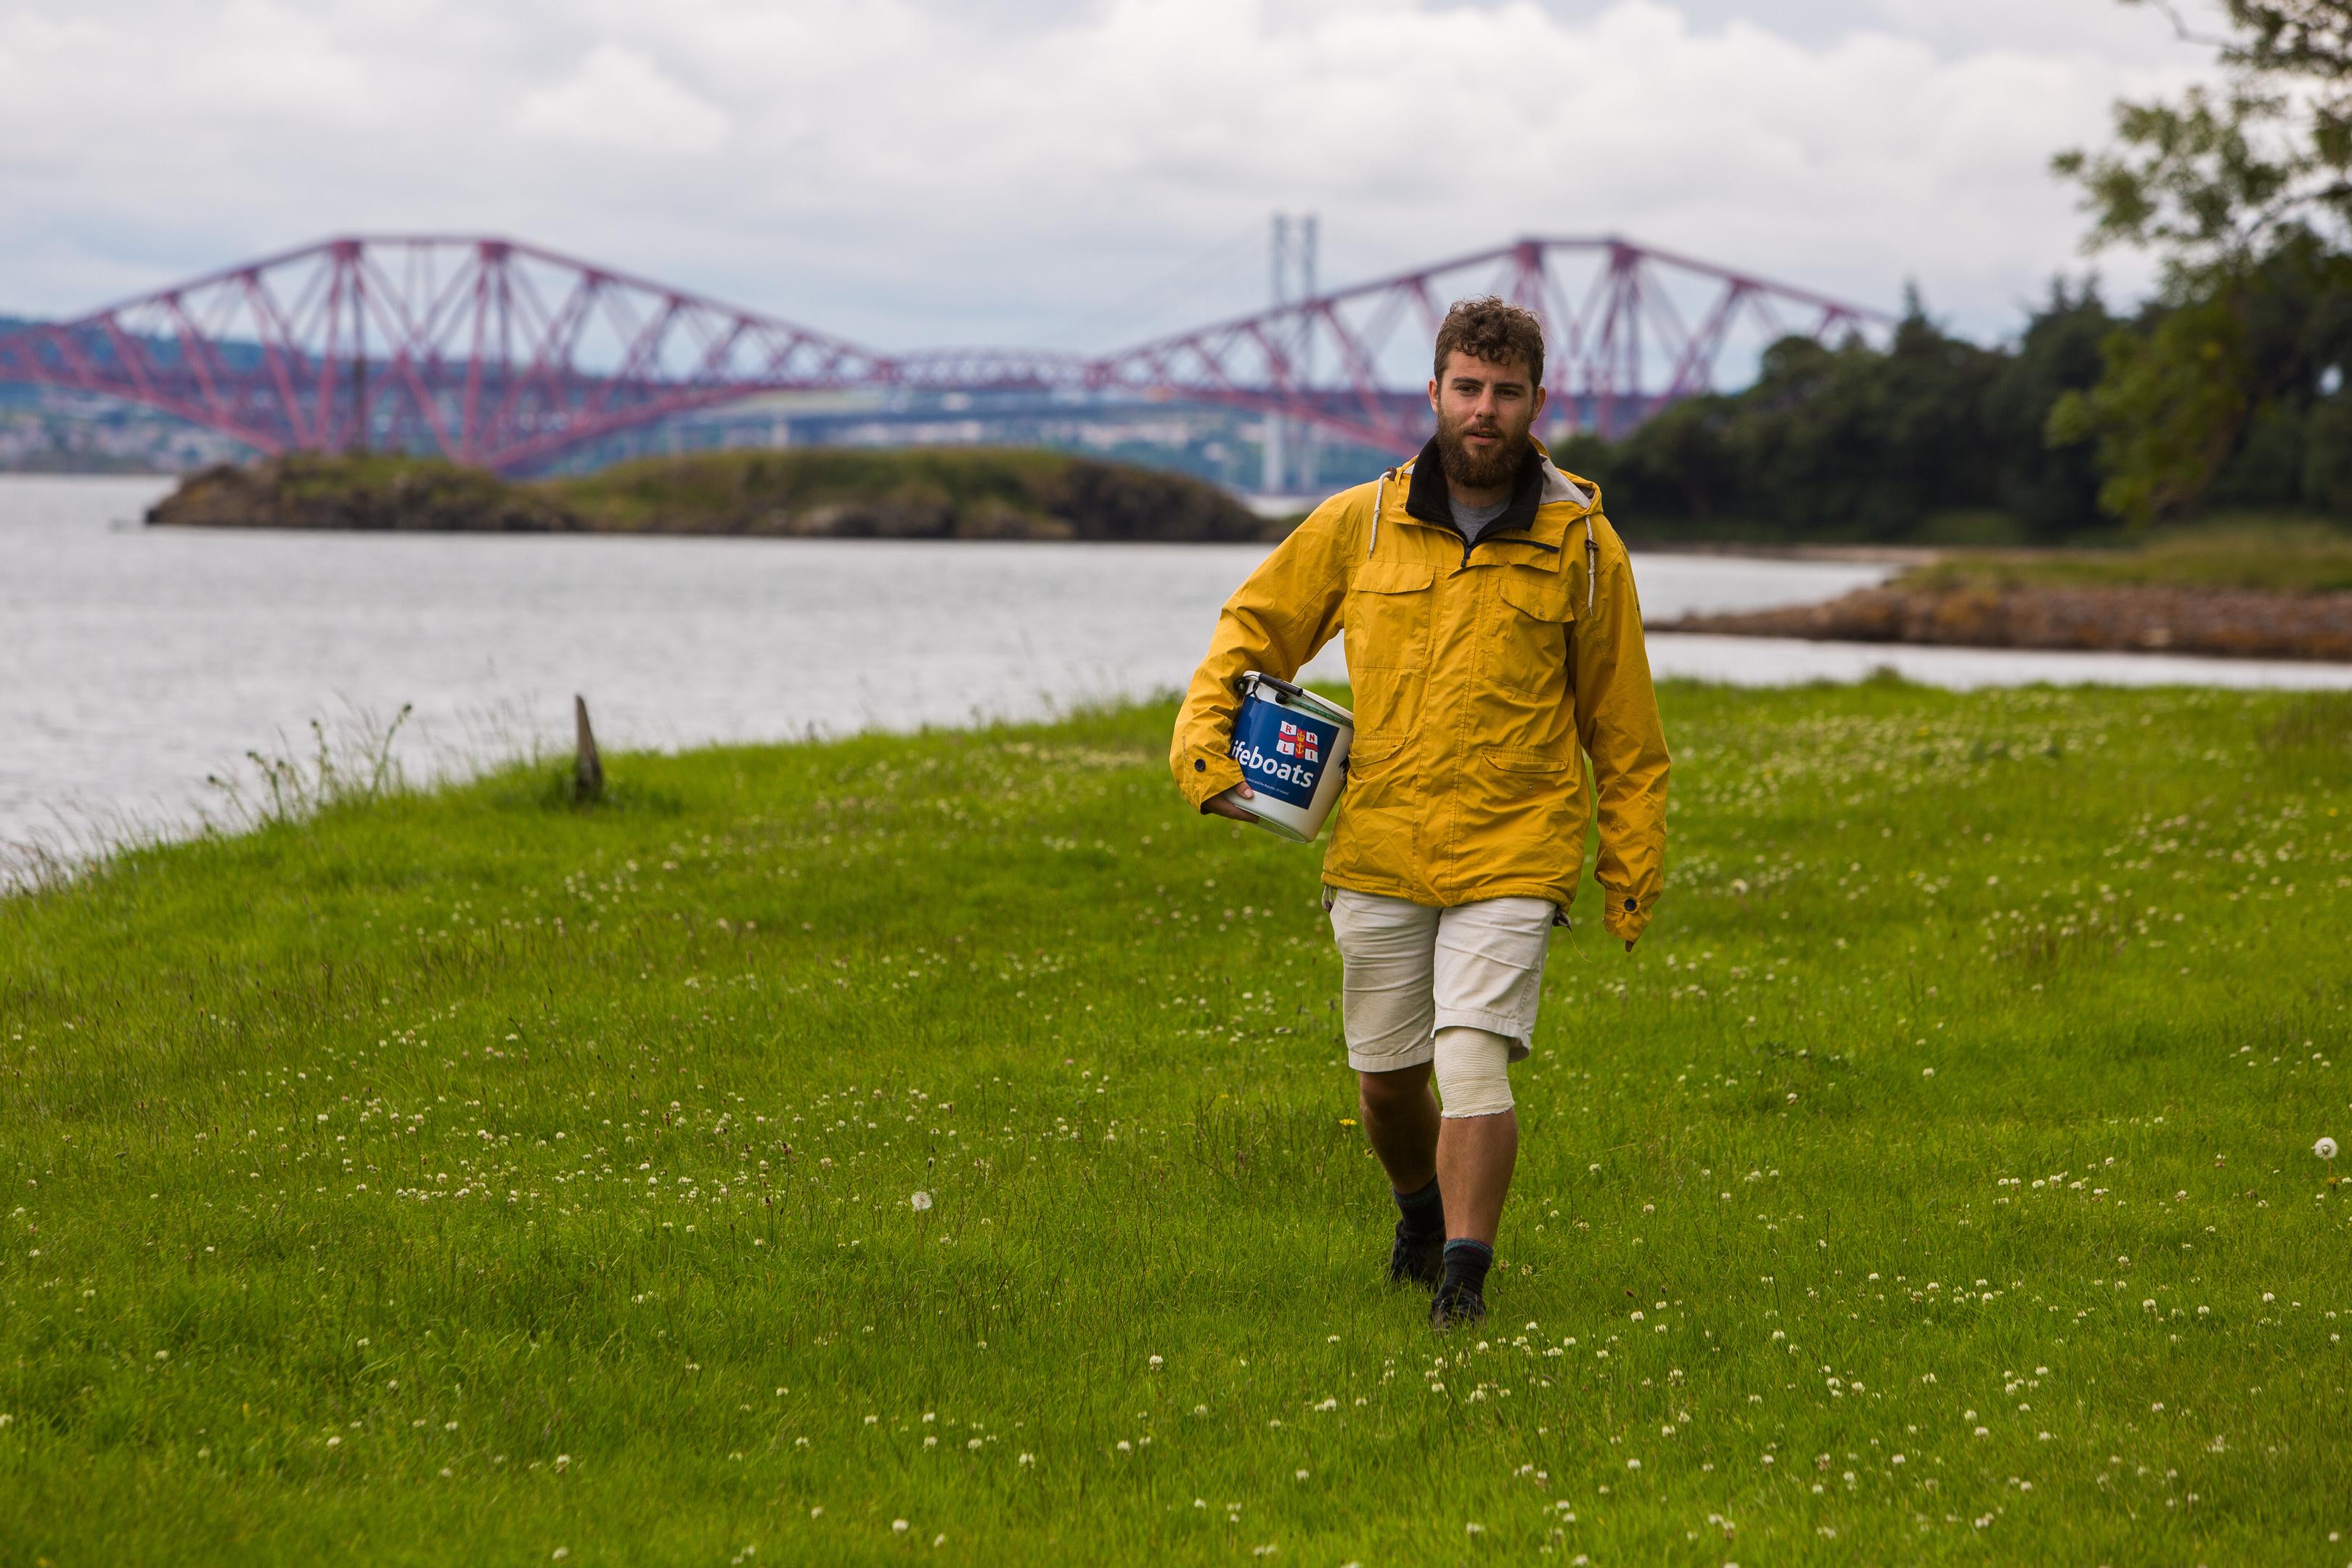 Fundraising walker Alex Ellis-Roswell on his walking journey.